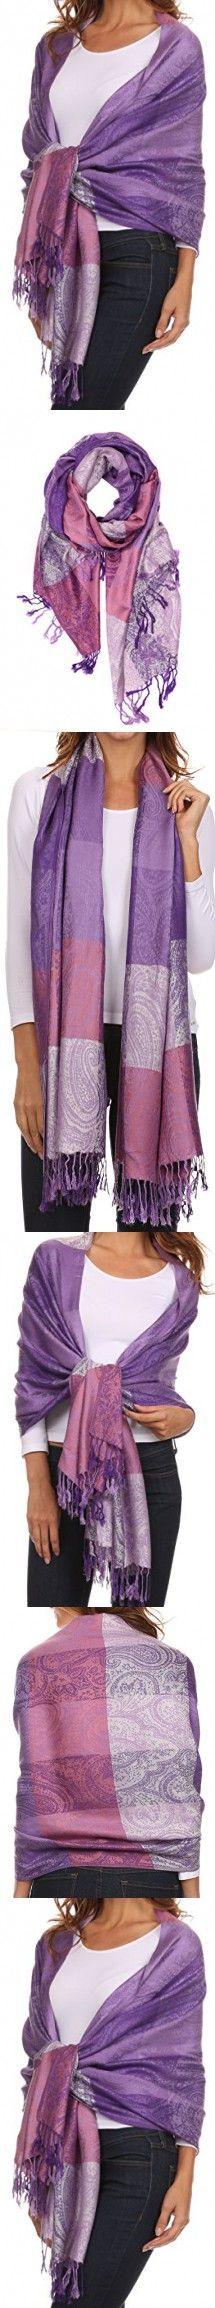 Sakkas CHS1611 - Avril colorful allover Paisley Pashmina/ Shawl/ Wrap/ Stole - 2-Purple - OS